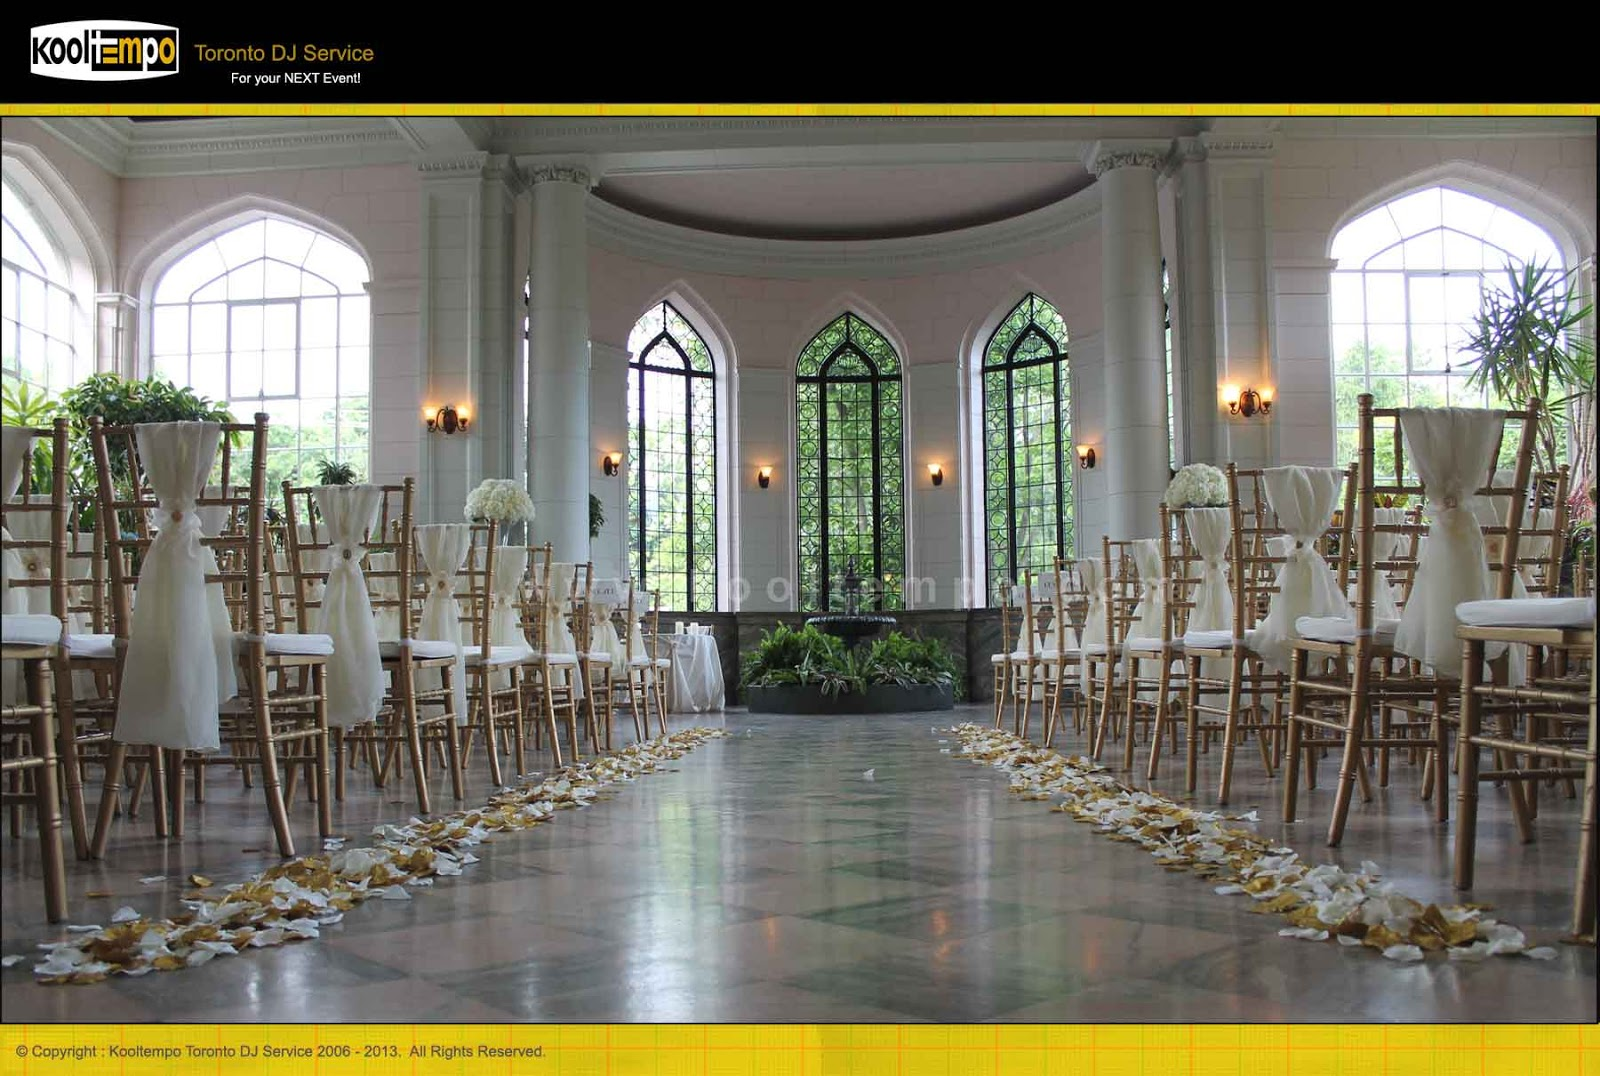 The Toronto Dj Official Blog Of Kooltempo Toronto Dj Service Wedding Dj Prom Dj Amp Party Dj